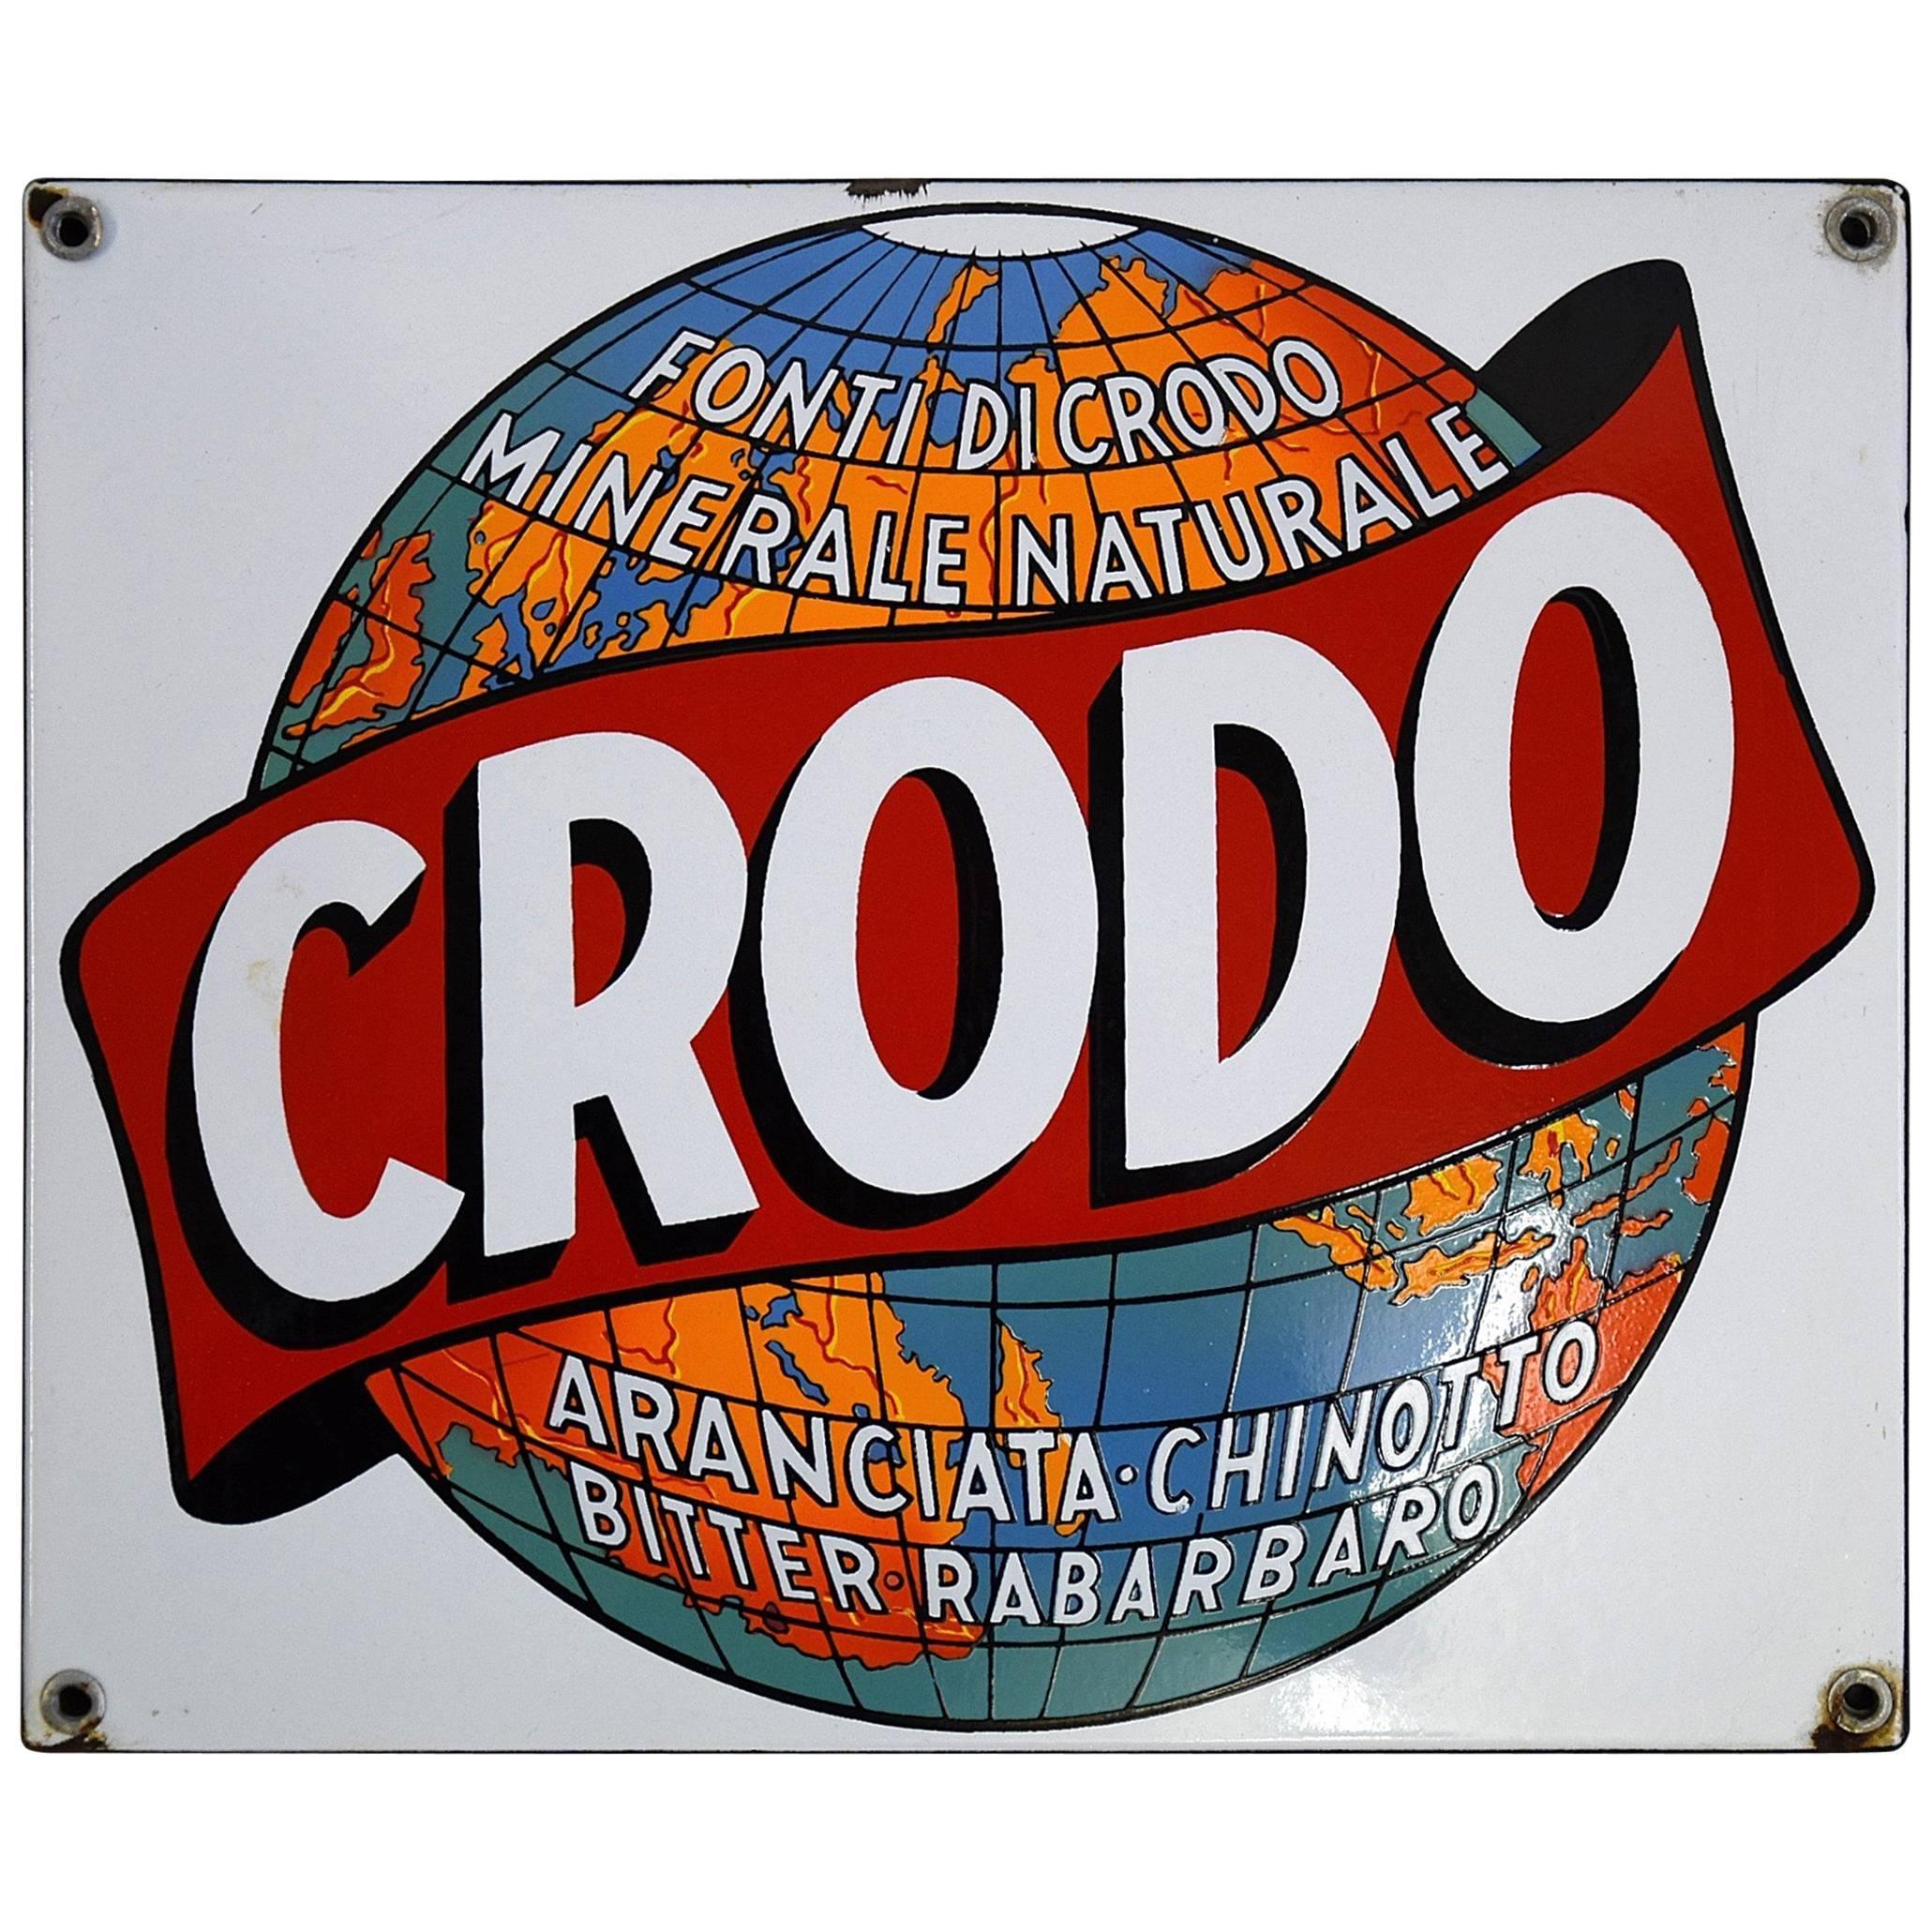 Italian Enamel 1960 Crodo Publicity Sign